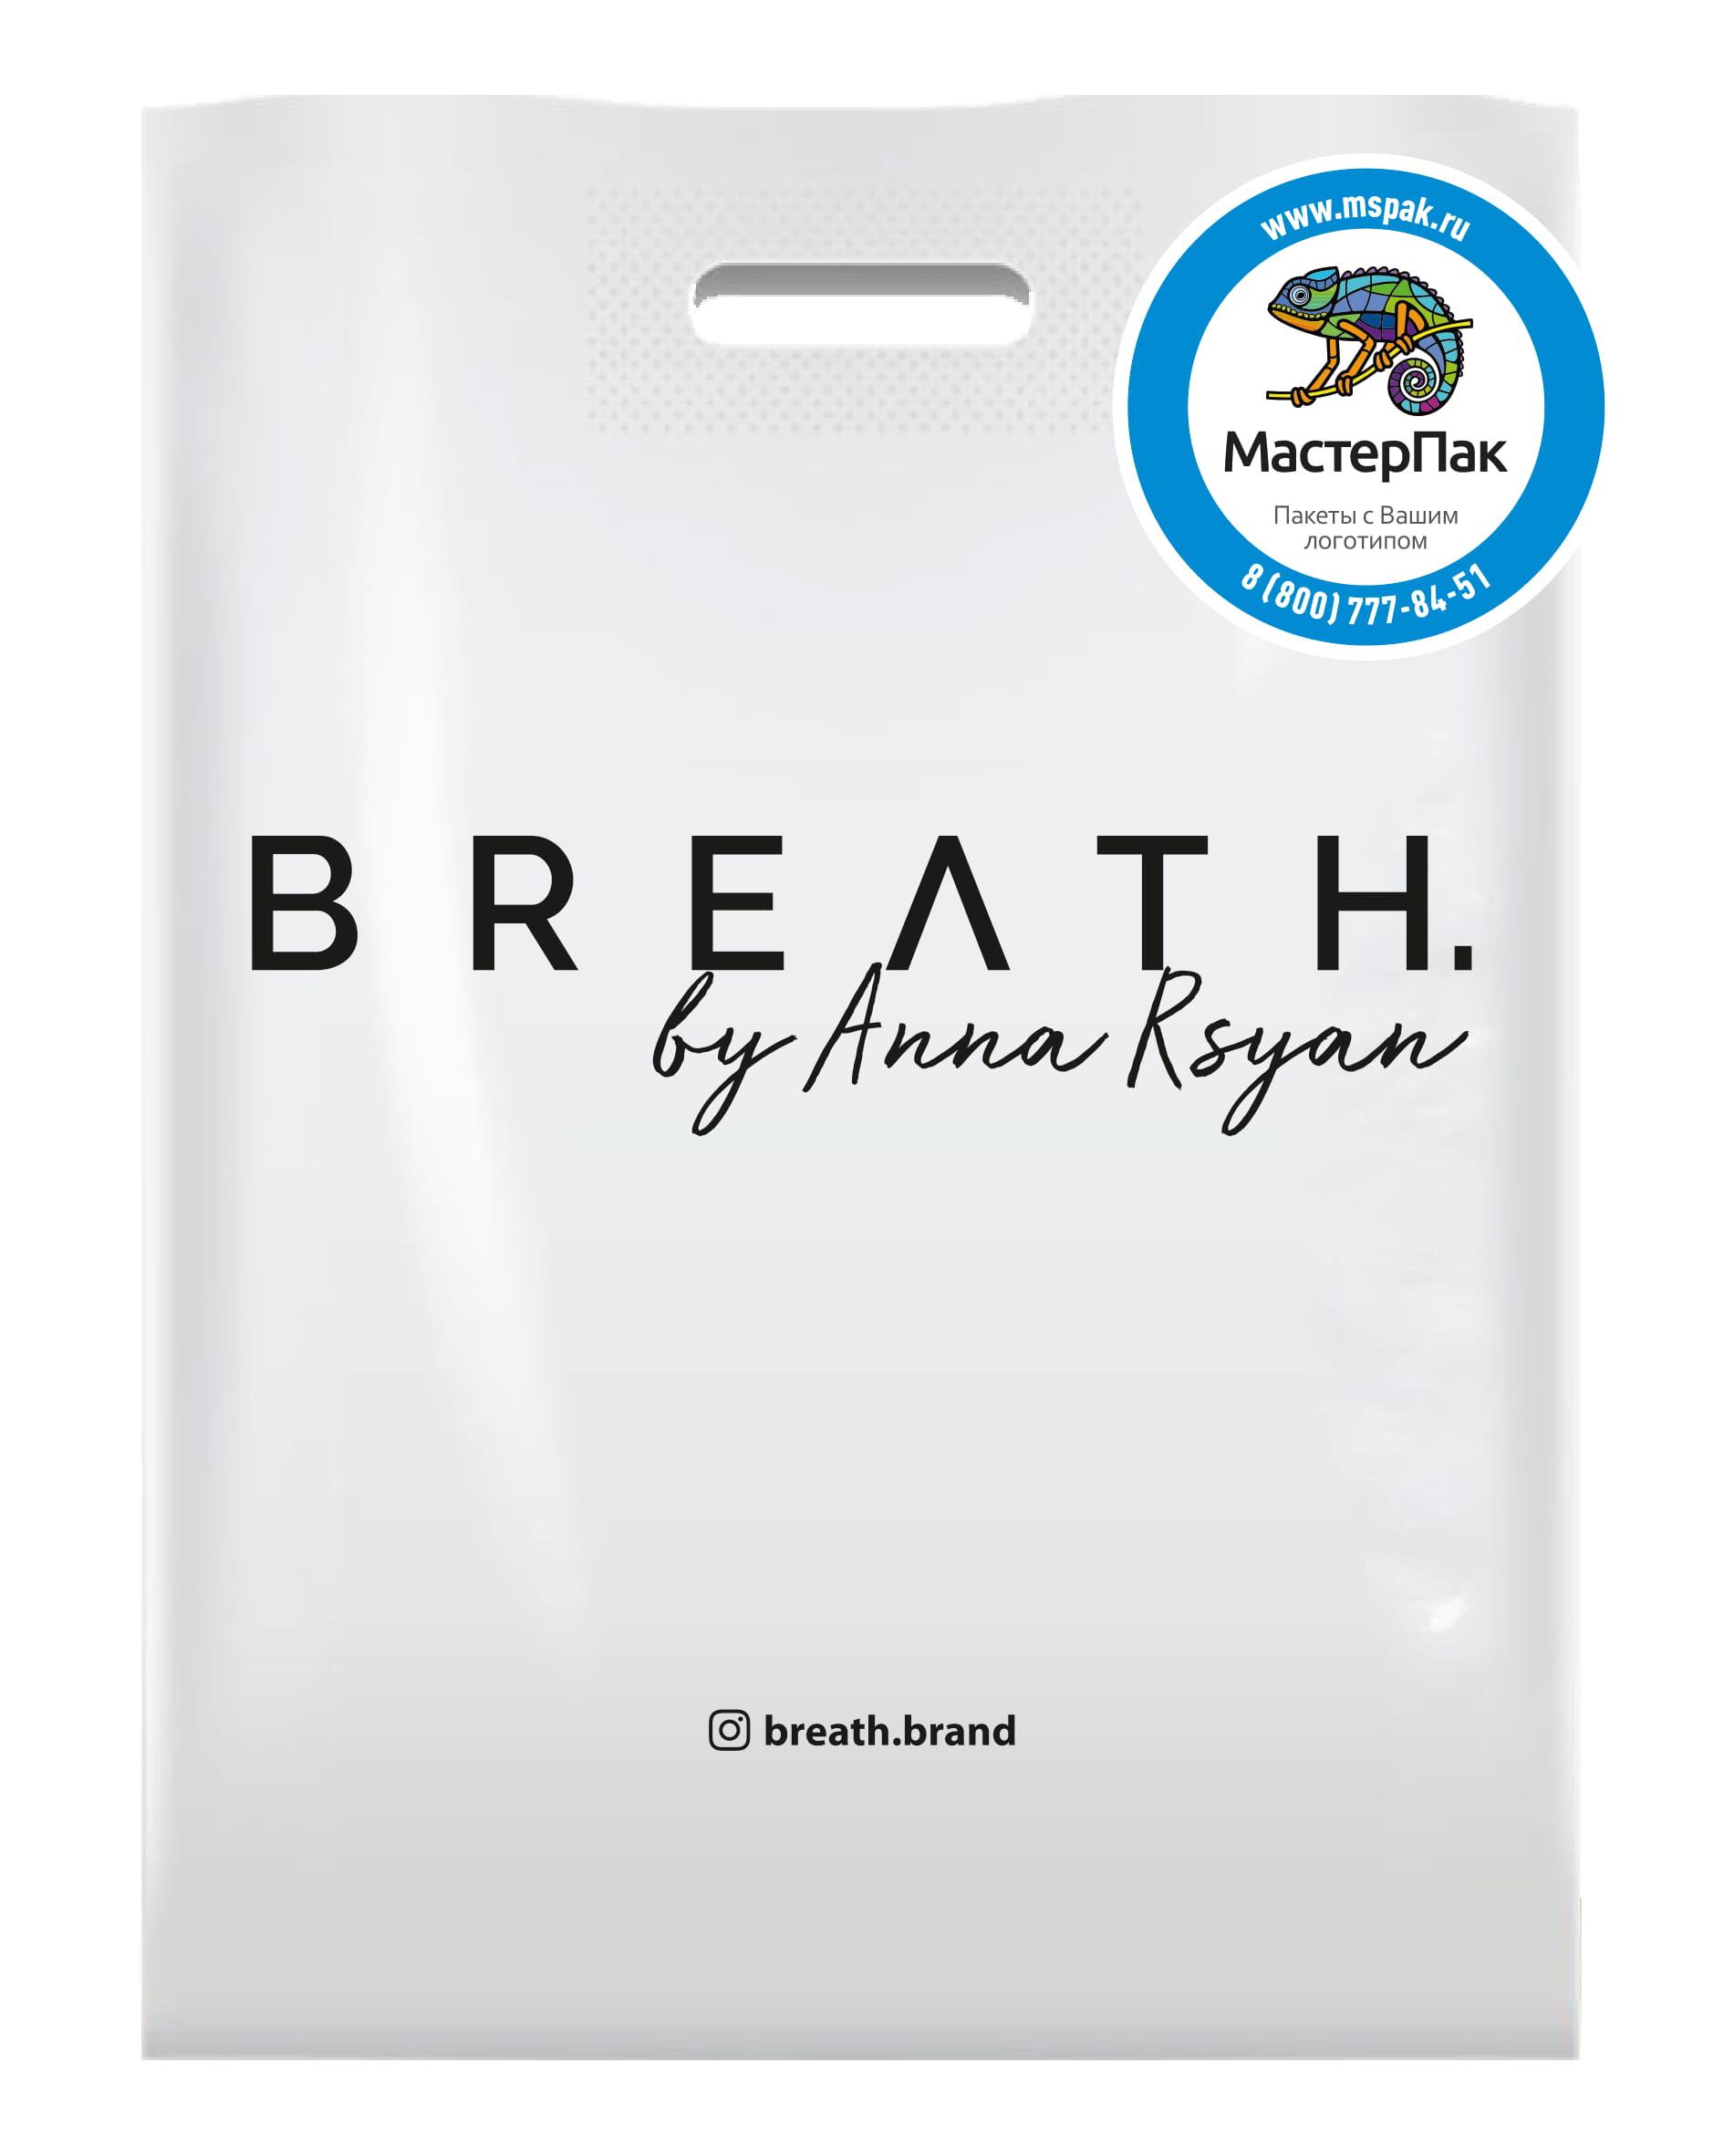 Пакет ПВД с логотипом Breath by Anna Rsyan, 70 мкм, 30*40